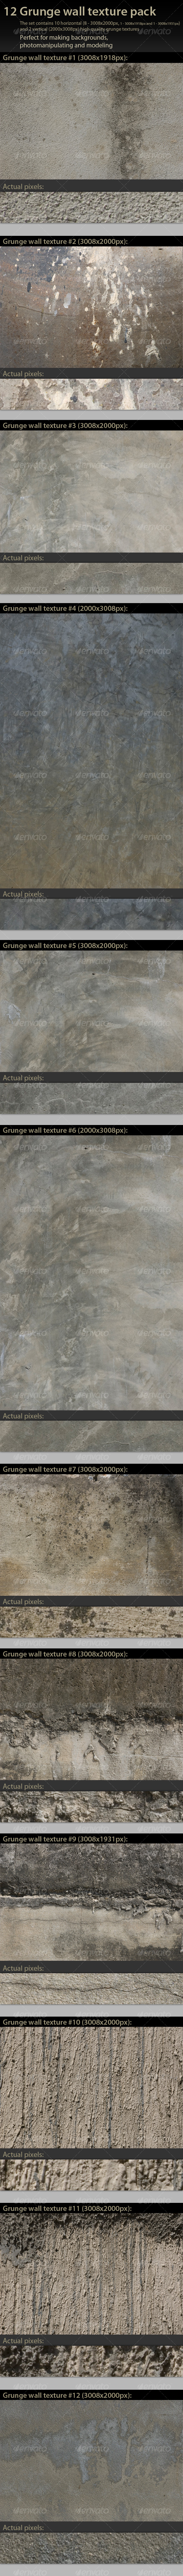 Grunge Wall Texture Pack - Industrial / Grunge Textures